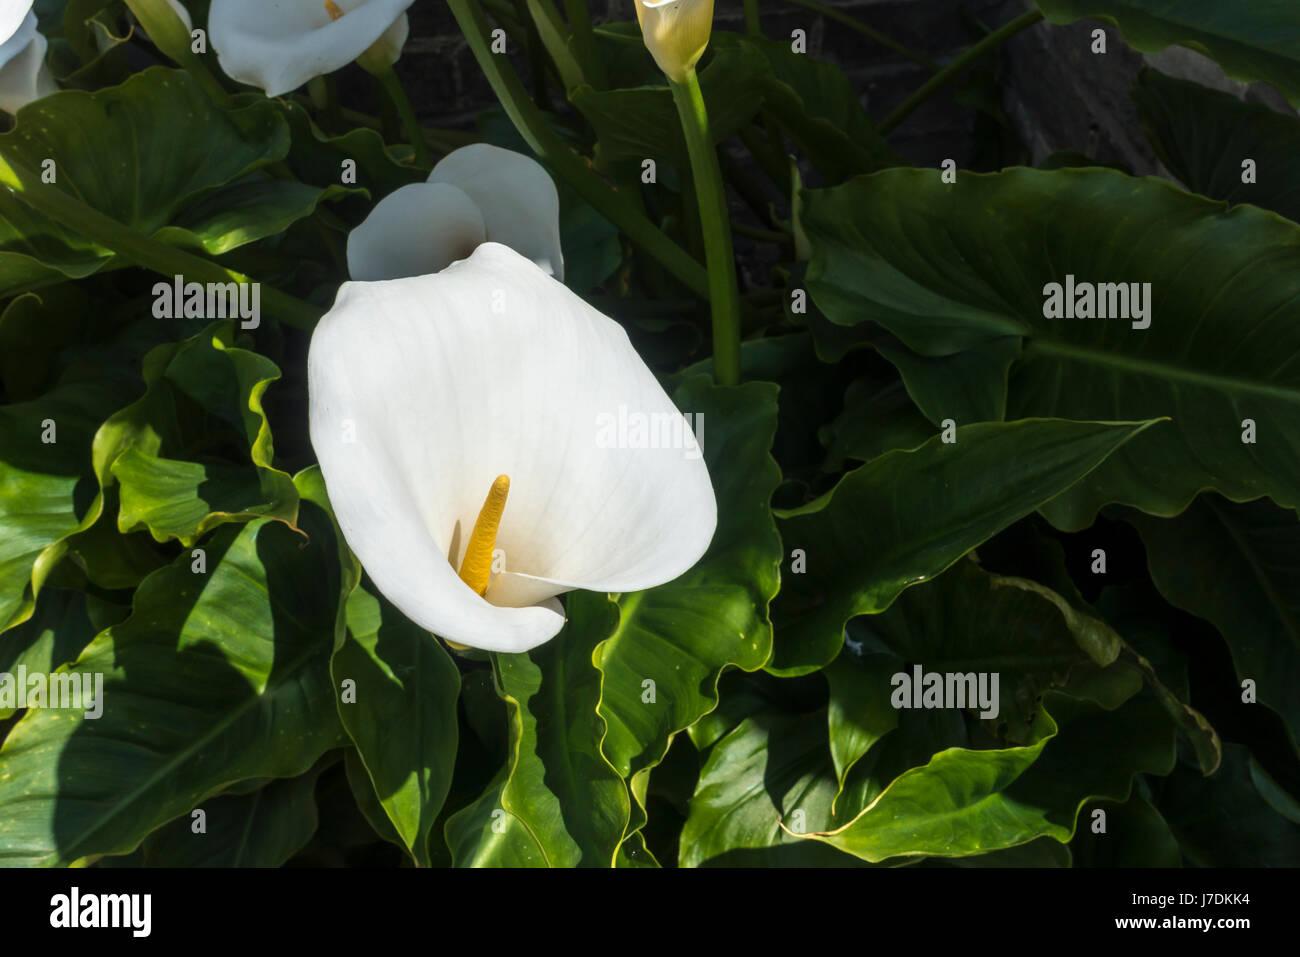 zantedeschia-aethiopica-hardy-white-arum